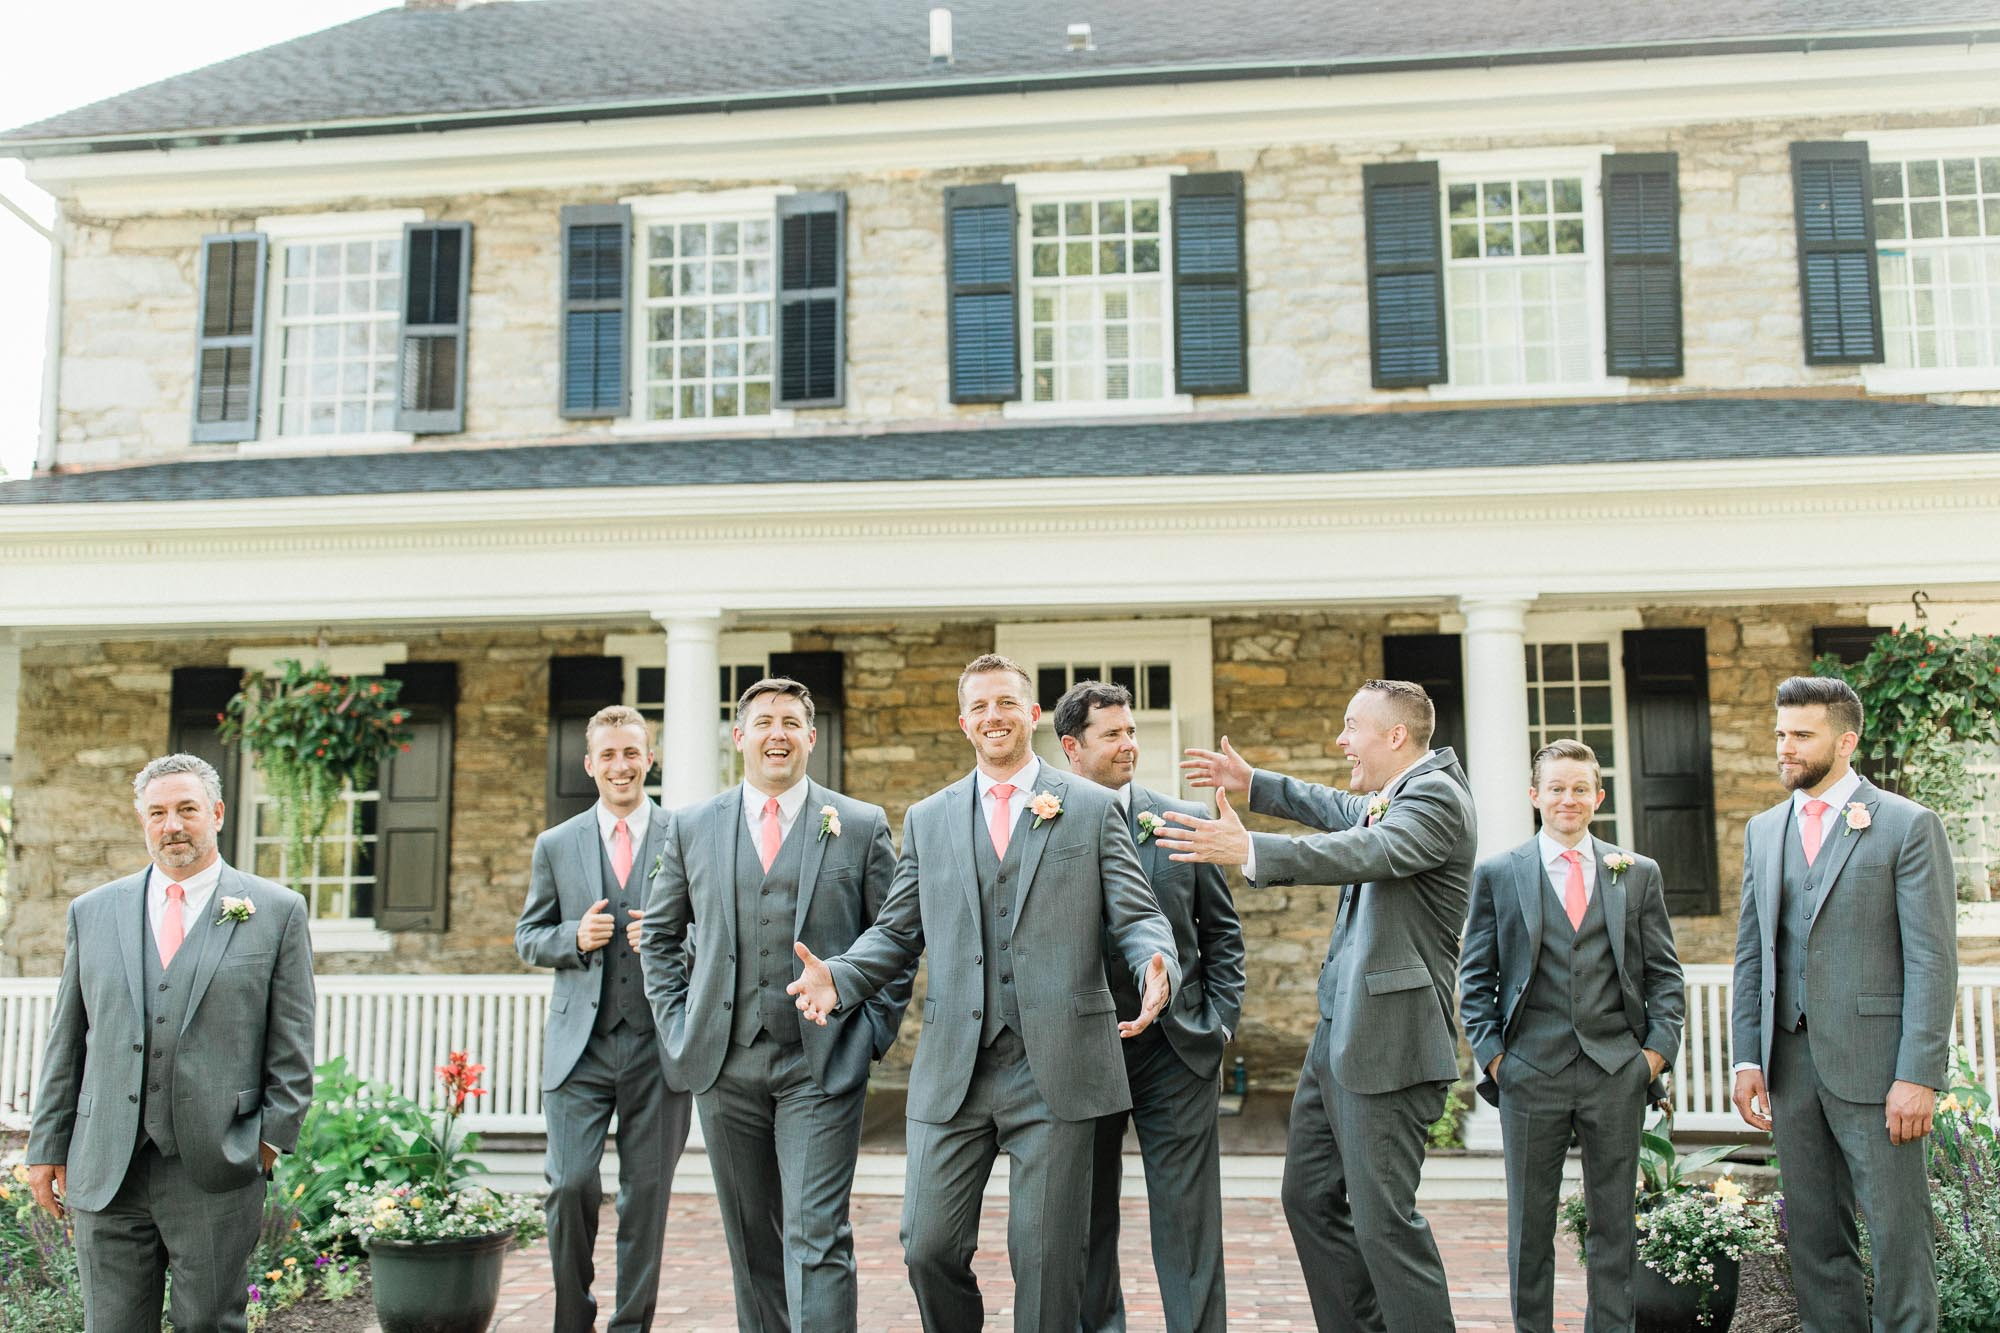 Allenberry-resort-historic-pennsylvania-wedding-10119.jpg